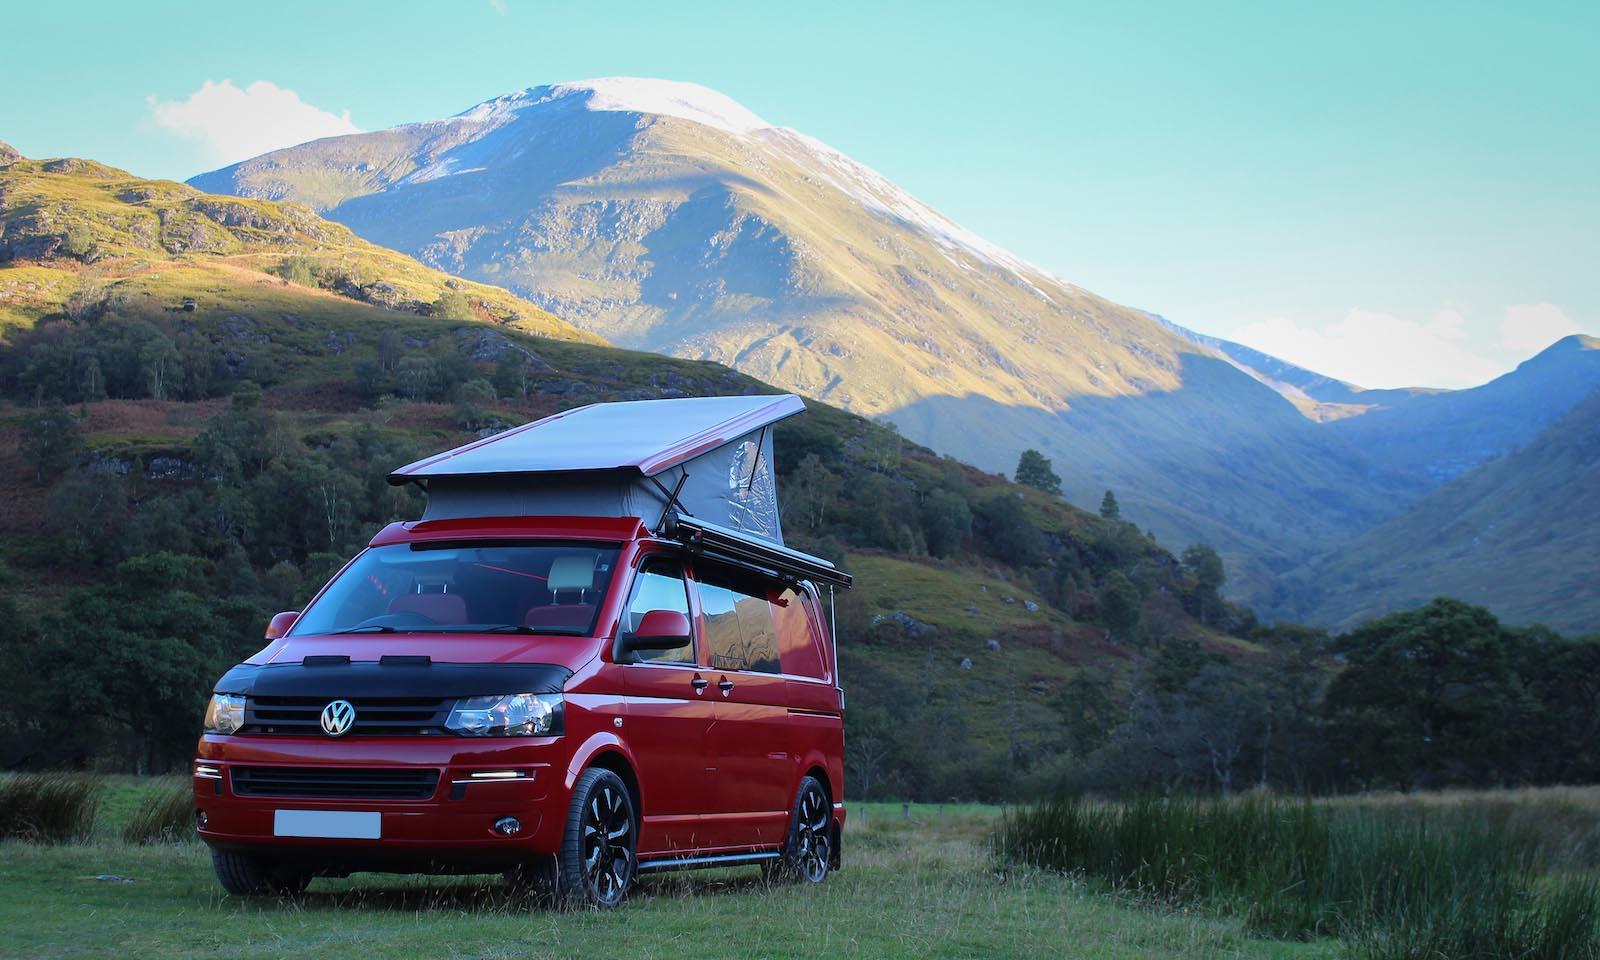 Camper Van Conversions Vans For Sale VanLife Campervan Guide Contact